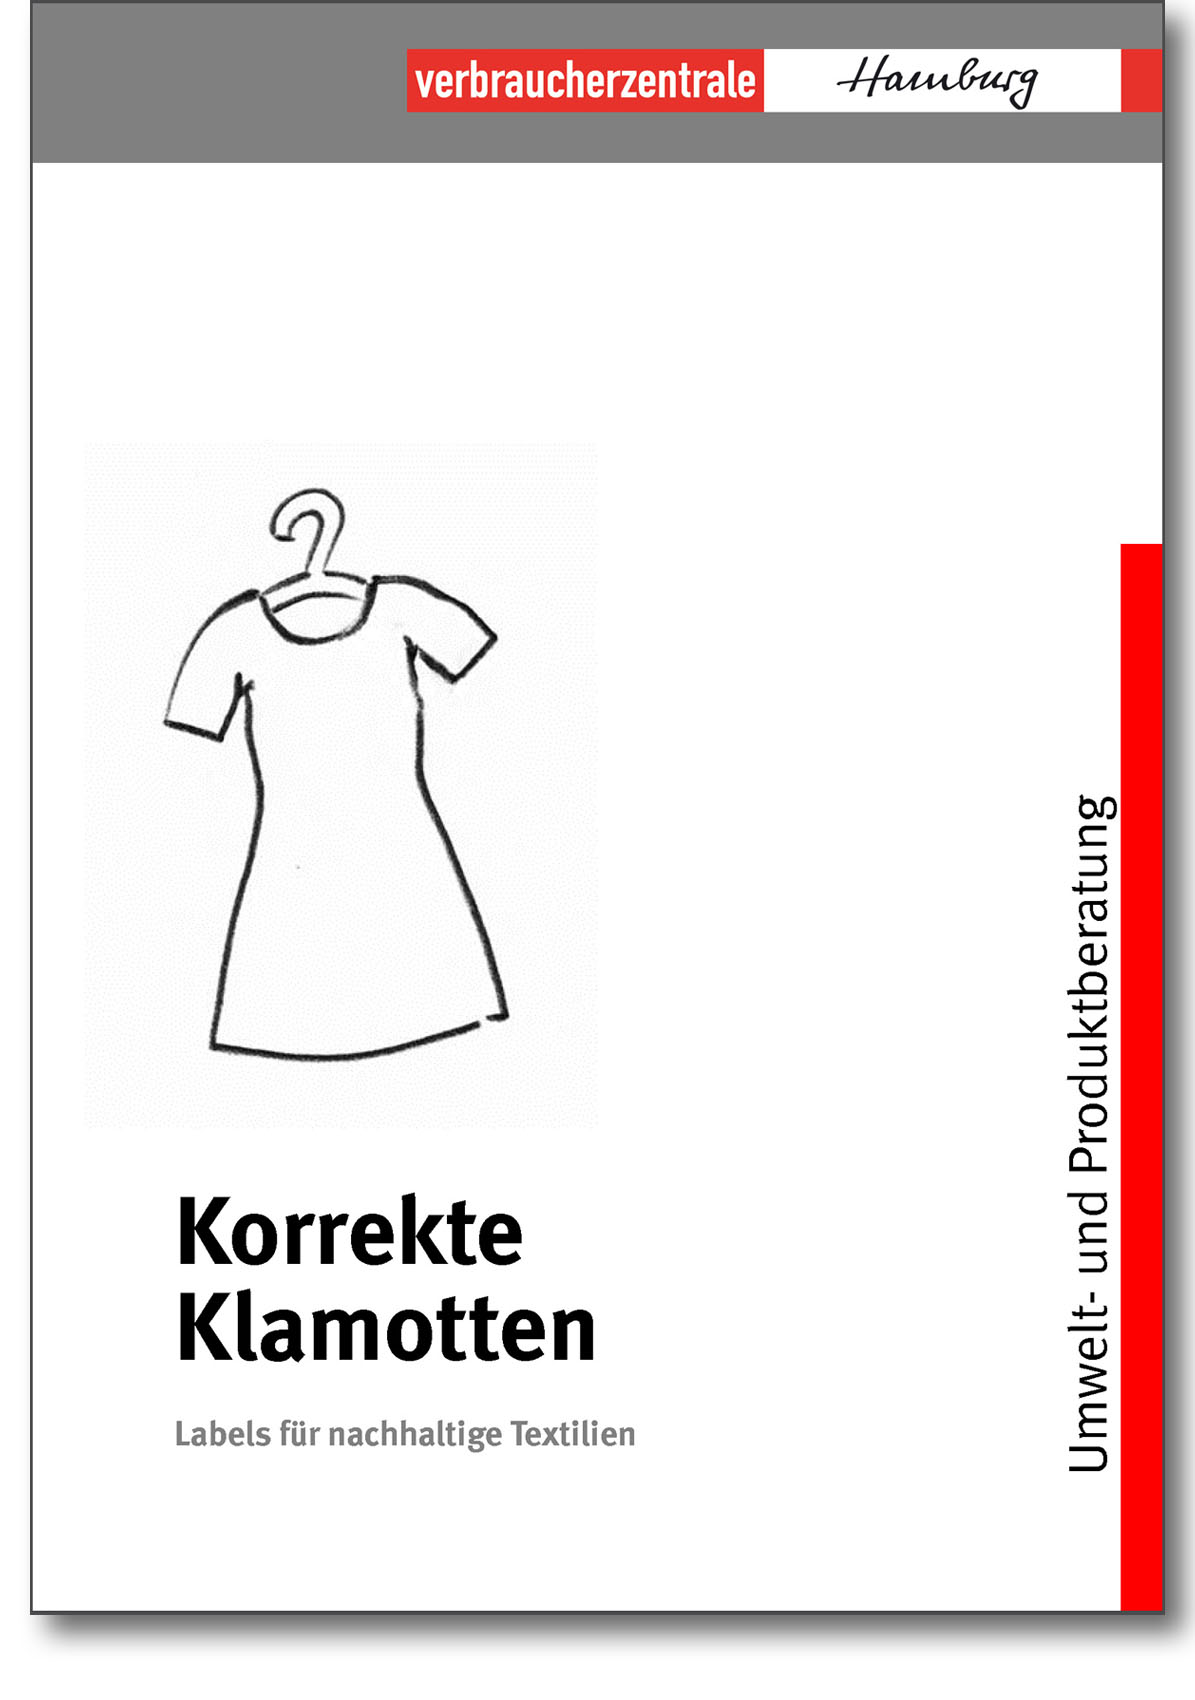 Infobroschüre - Korrekte Klamotten - Verbraucherzentrale